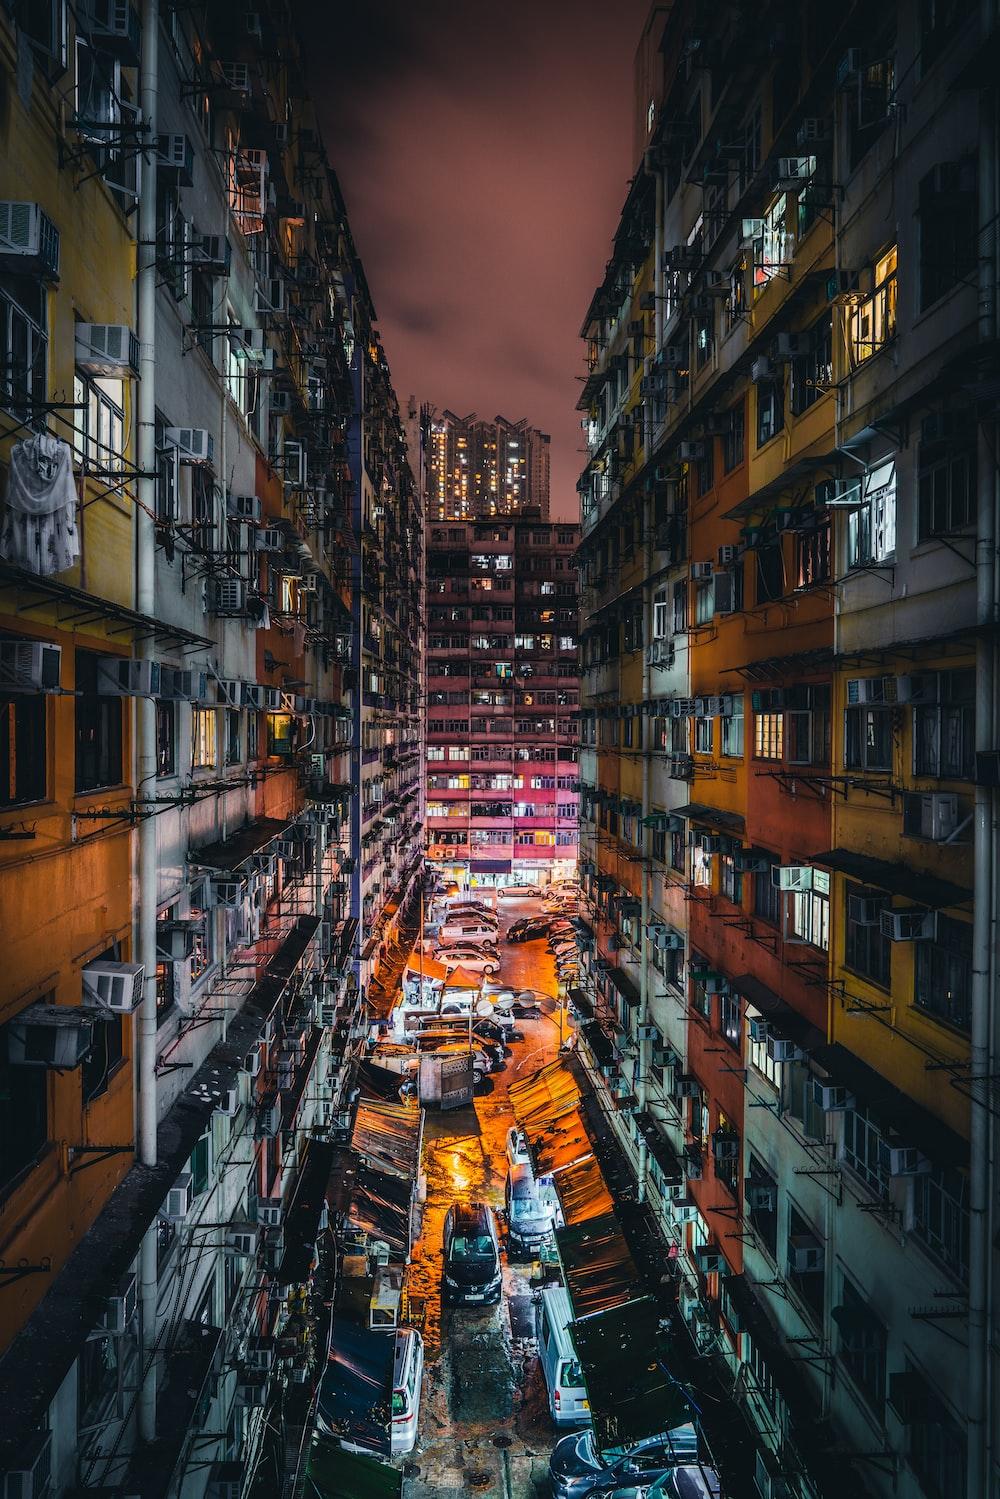 vehicles in between two buildings